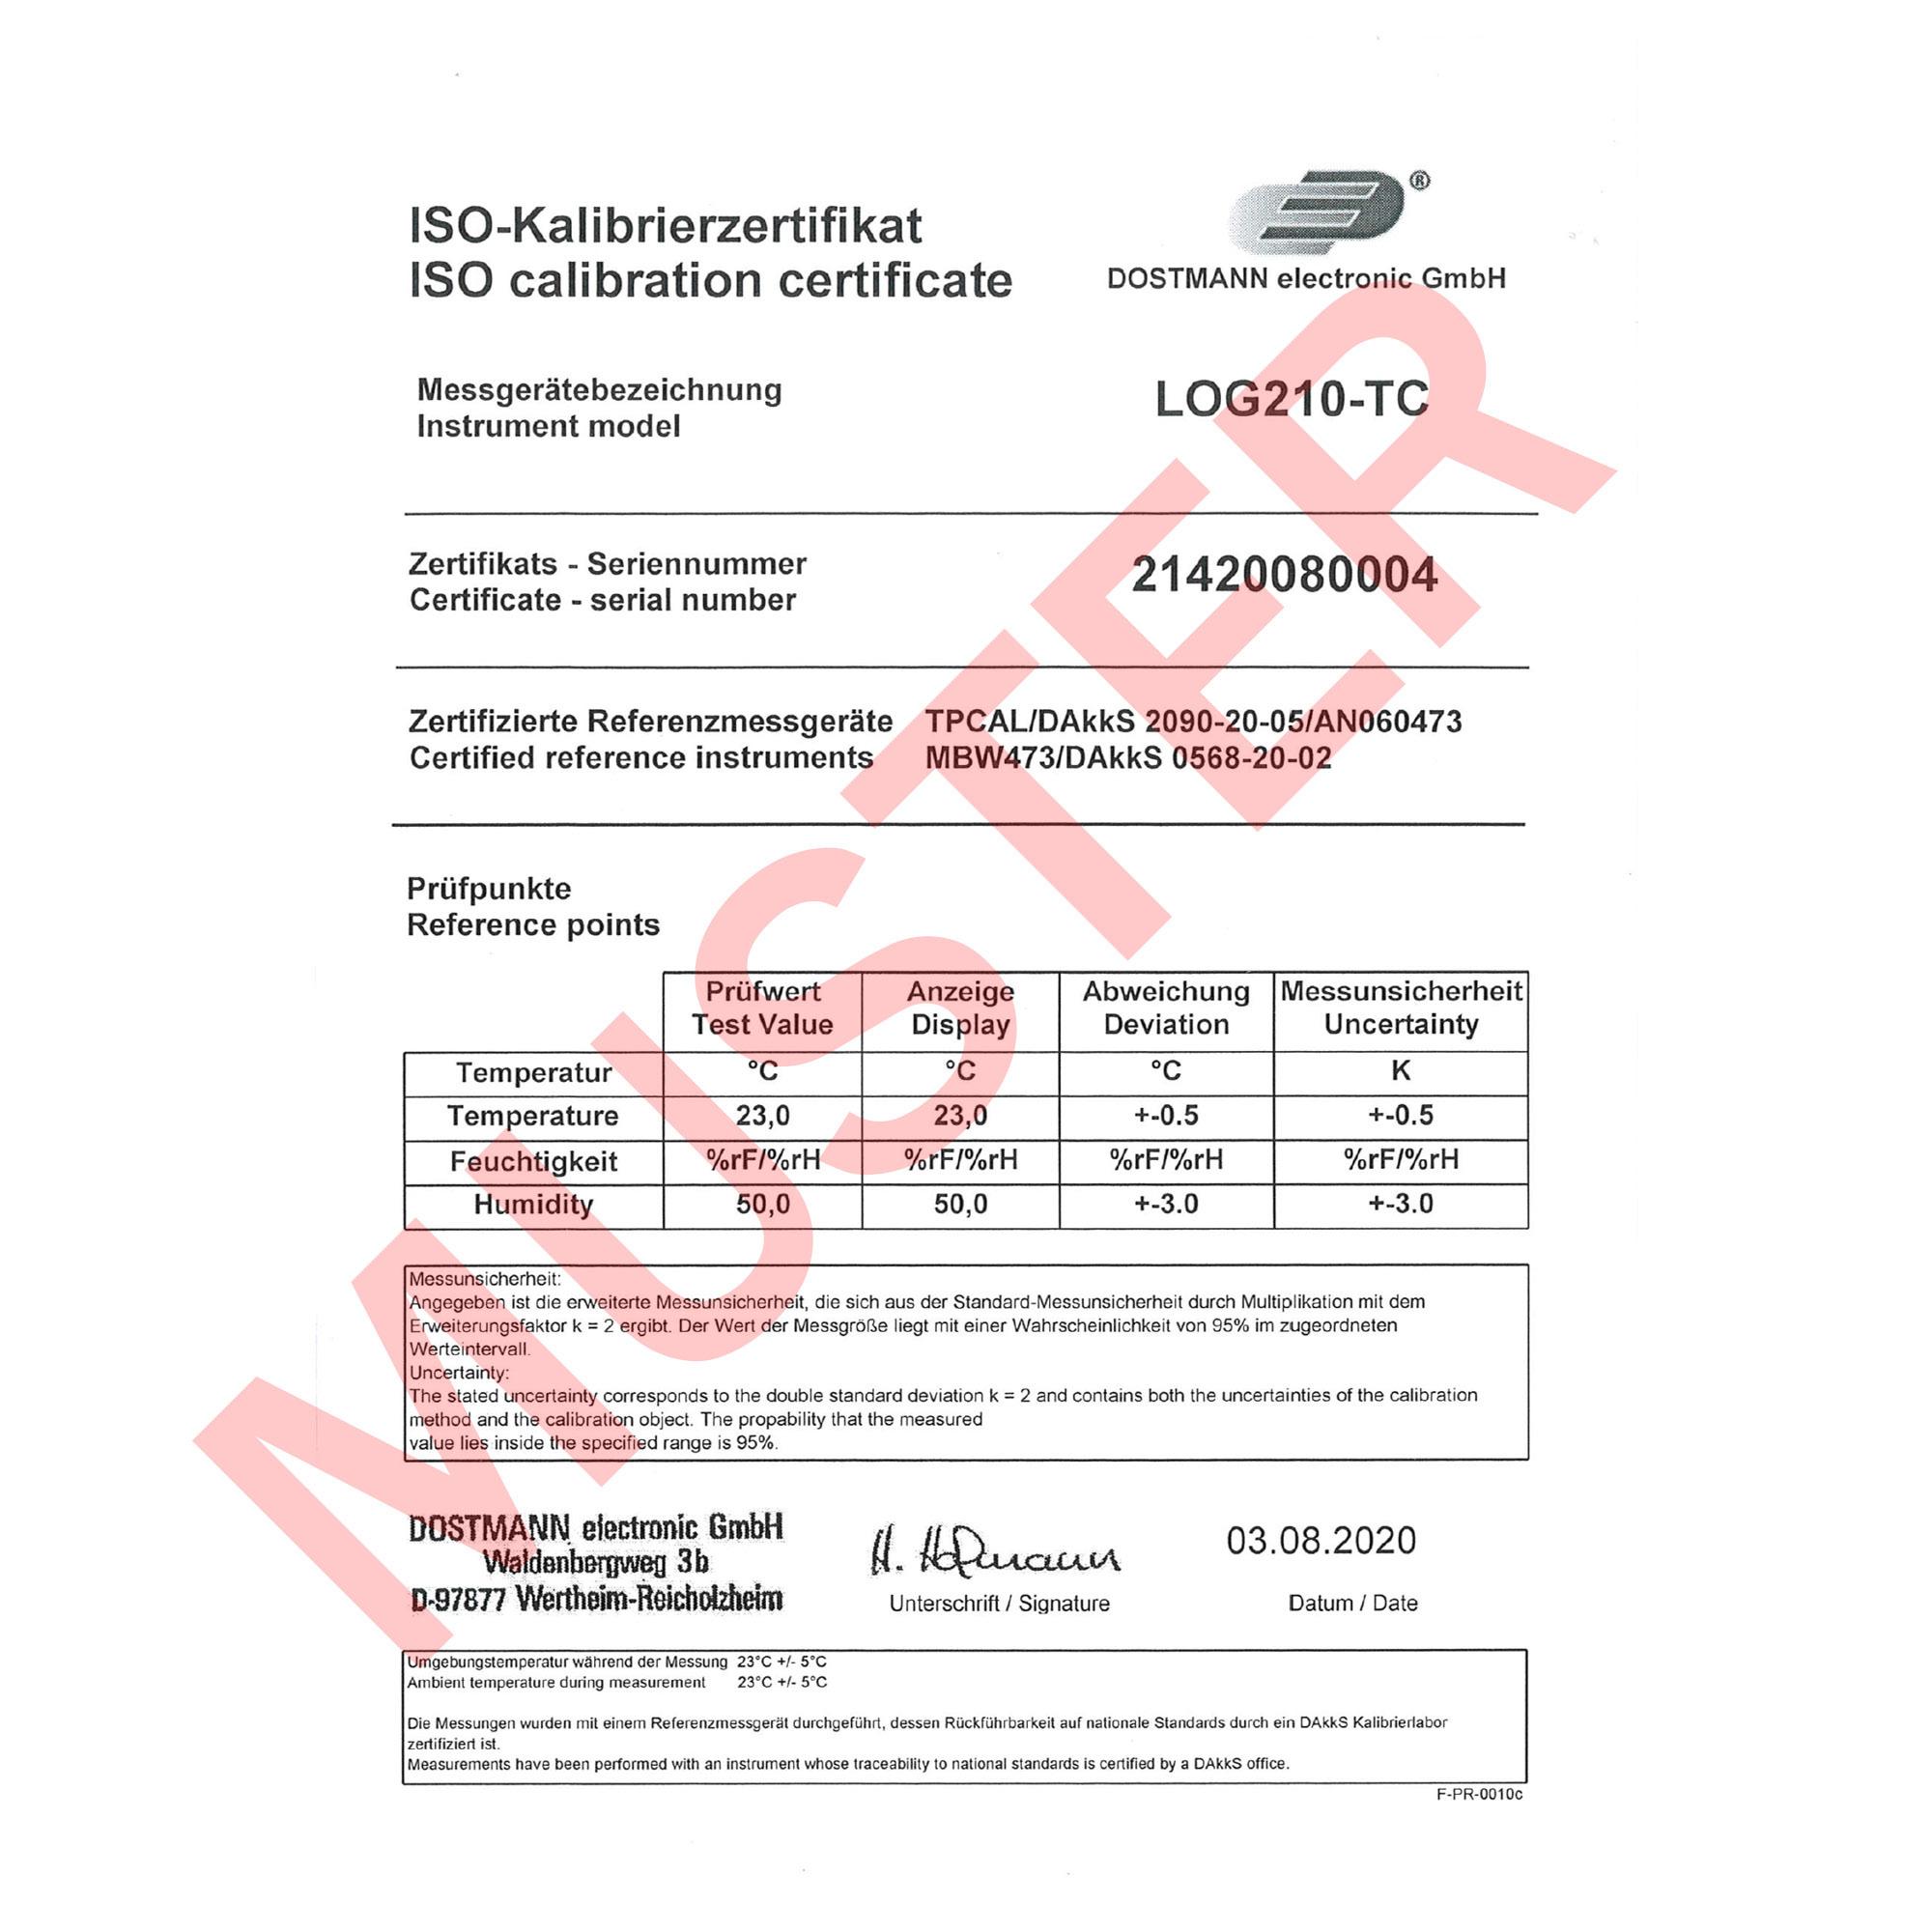 Zertifikat Muster Artikelnummer 311061.jpg